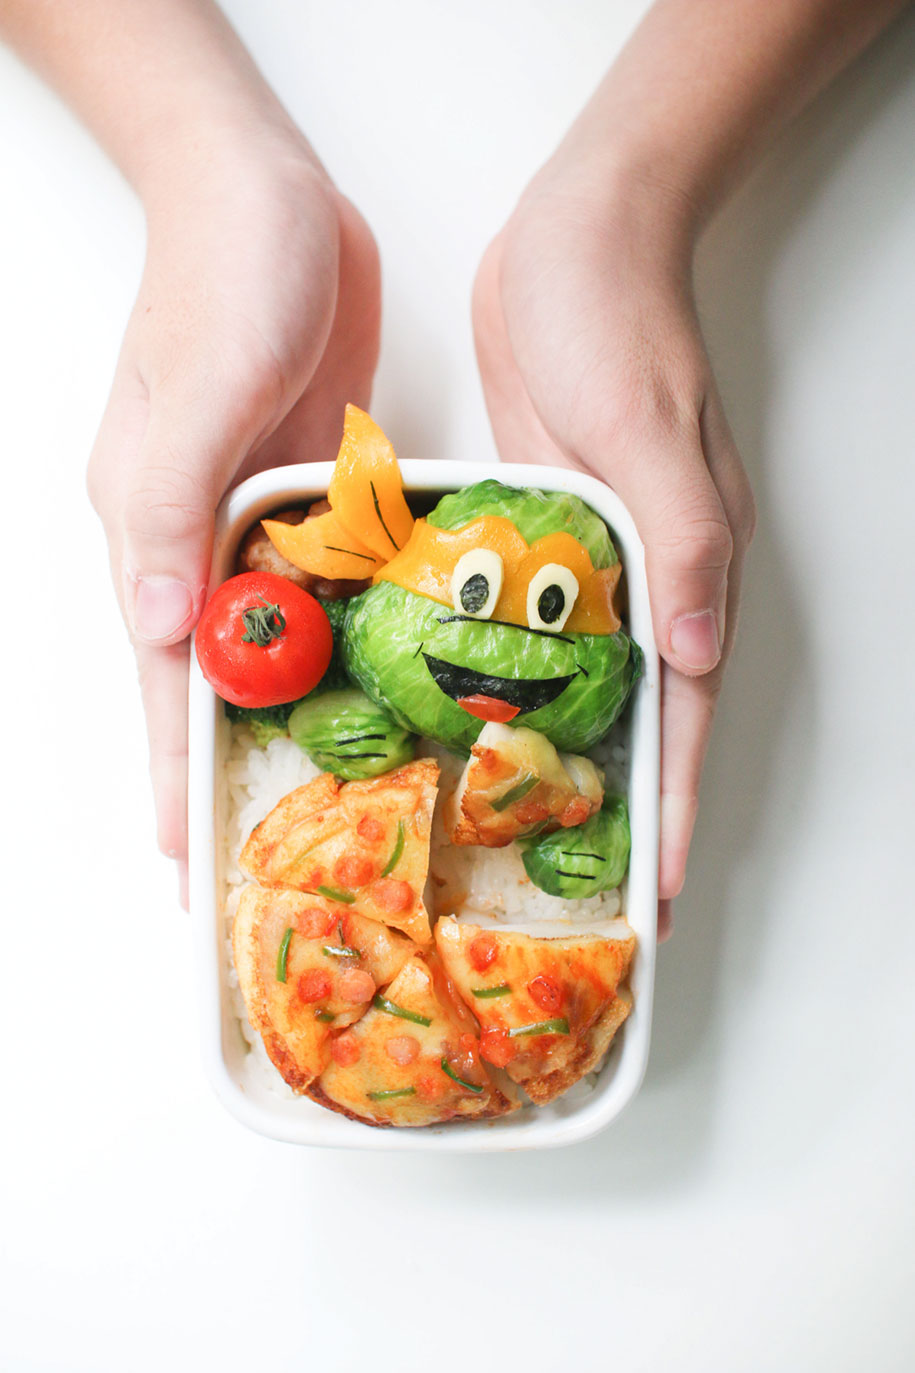 cute-school-lunch-food-mom-bento-li-ming-lee-14